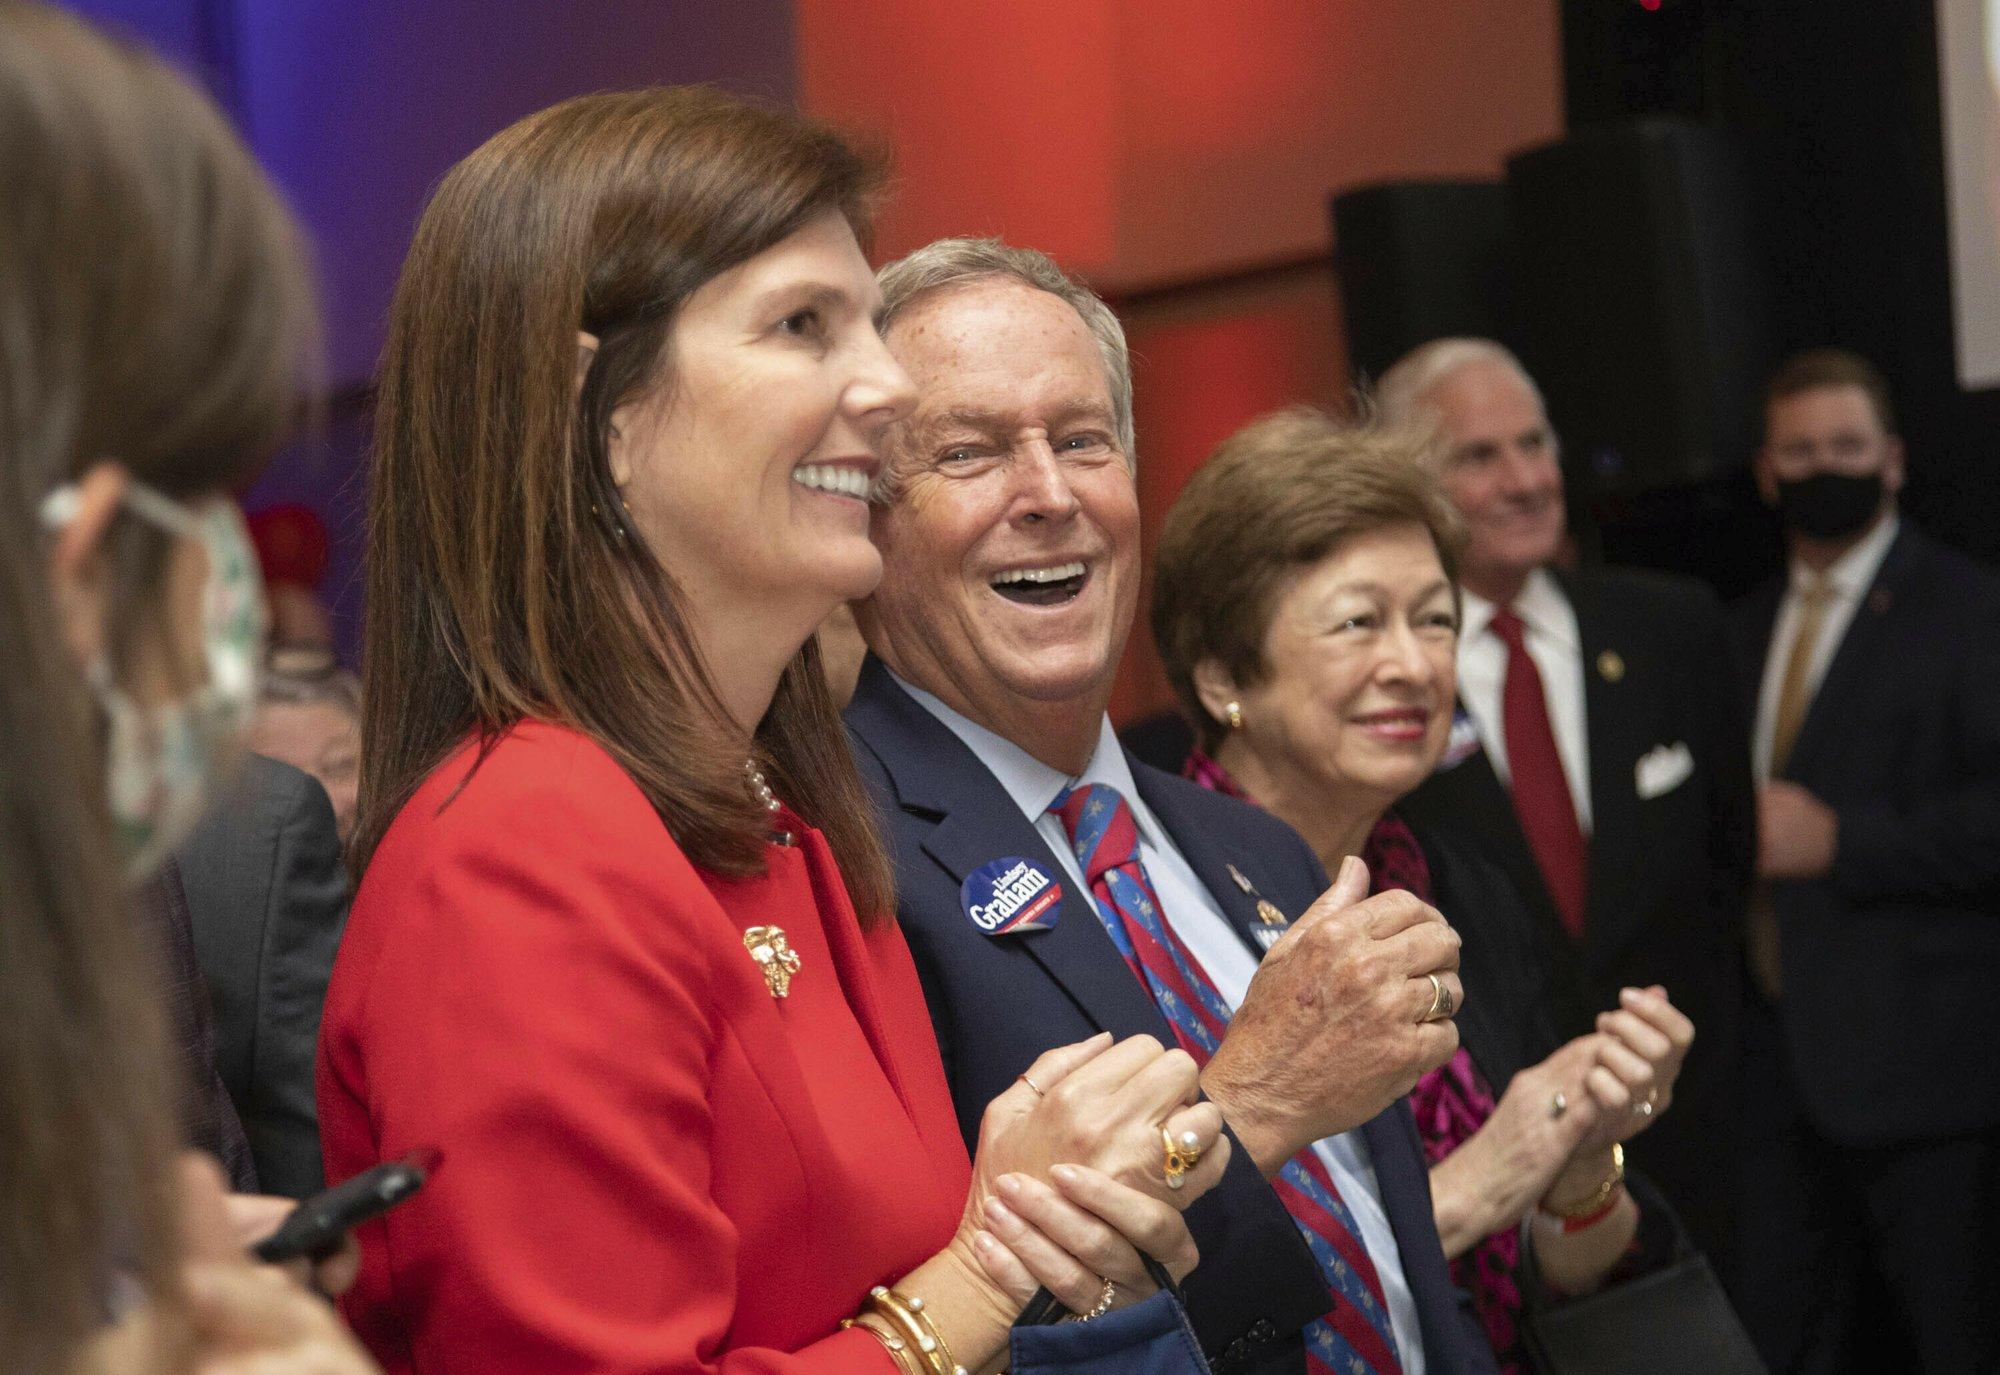 6 Incumbents Including Wilson Win Us House Races In Sc Congressman joe wilson speaks on continued economic recovery. 6 incumbents including wilson win us